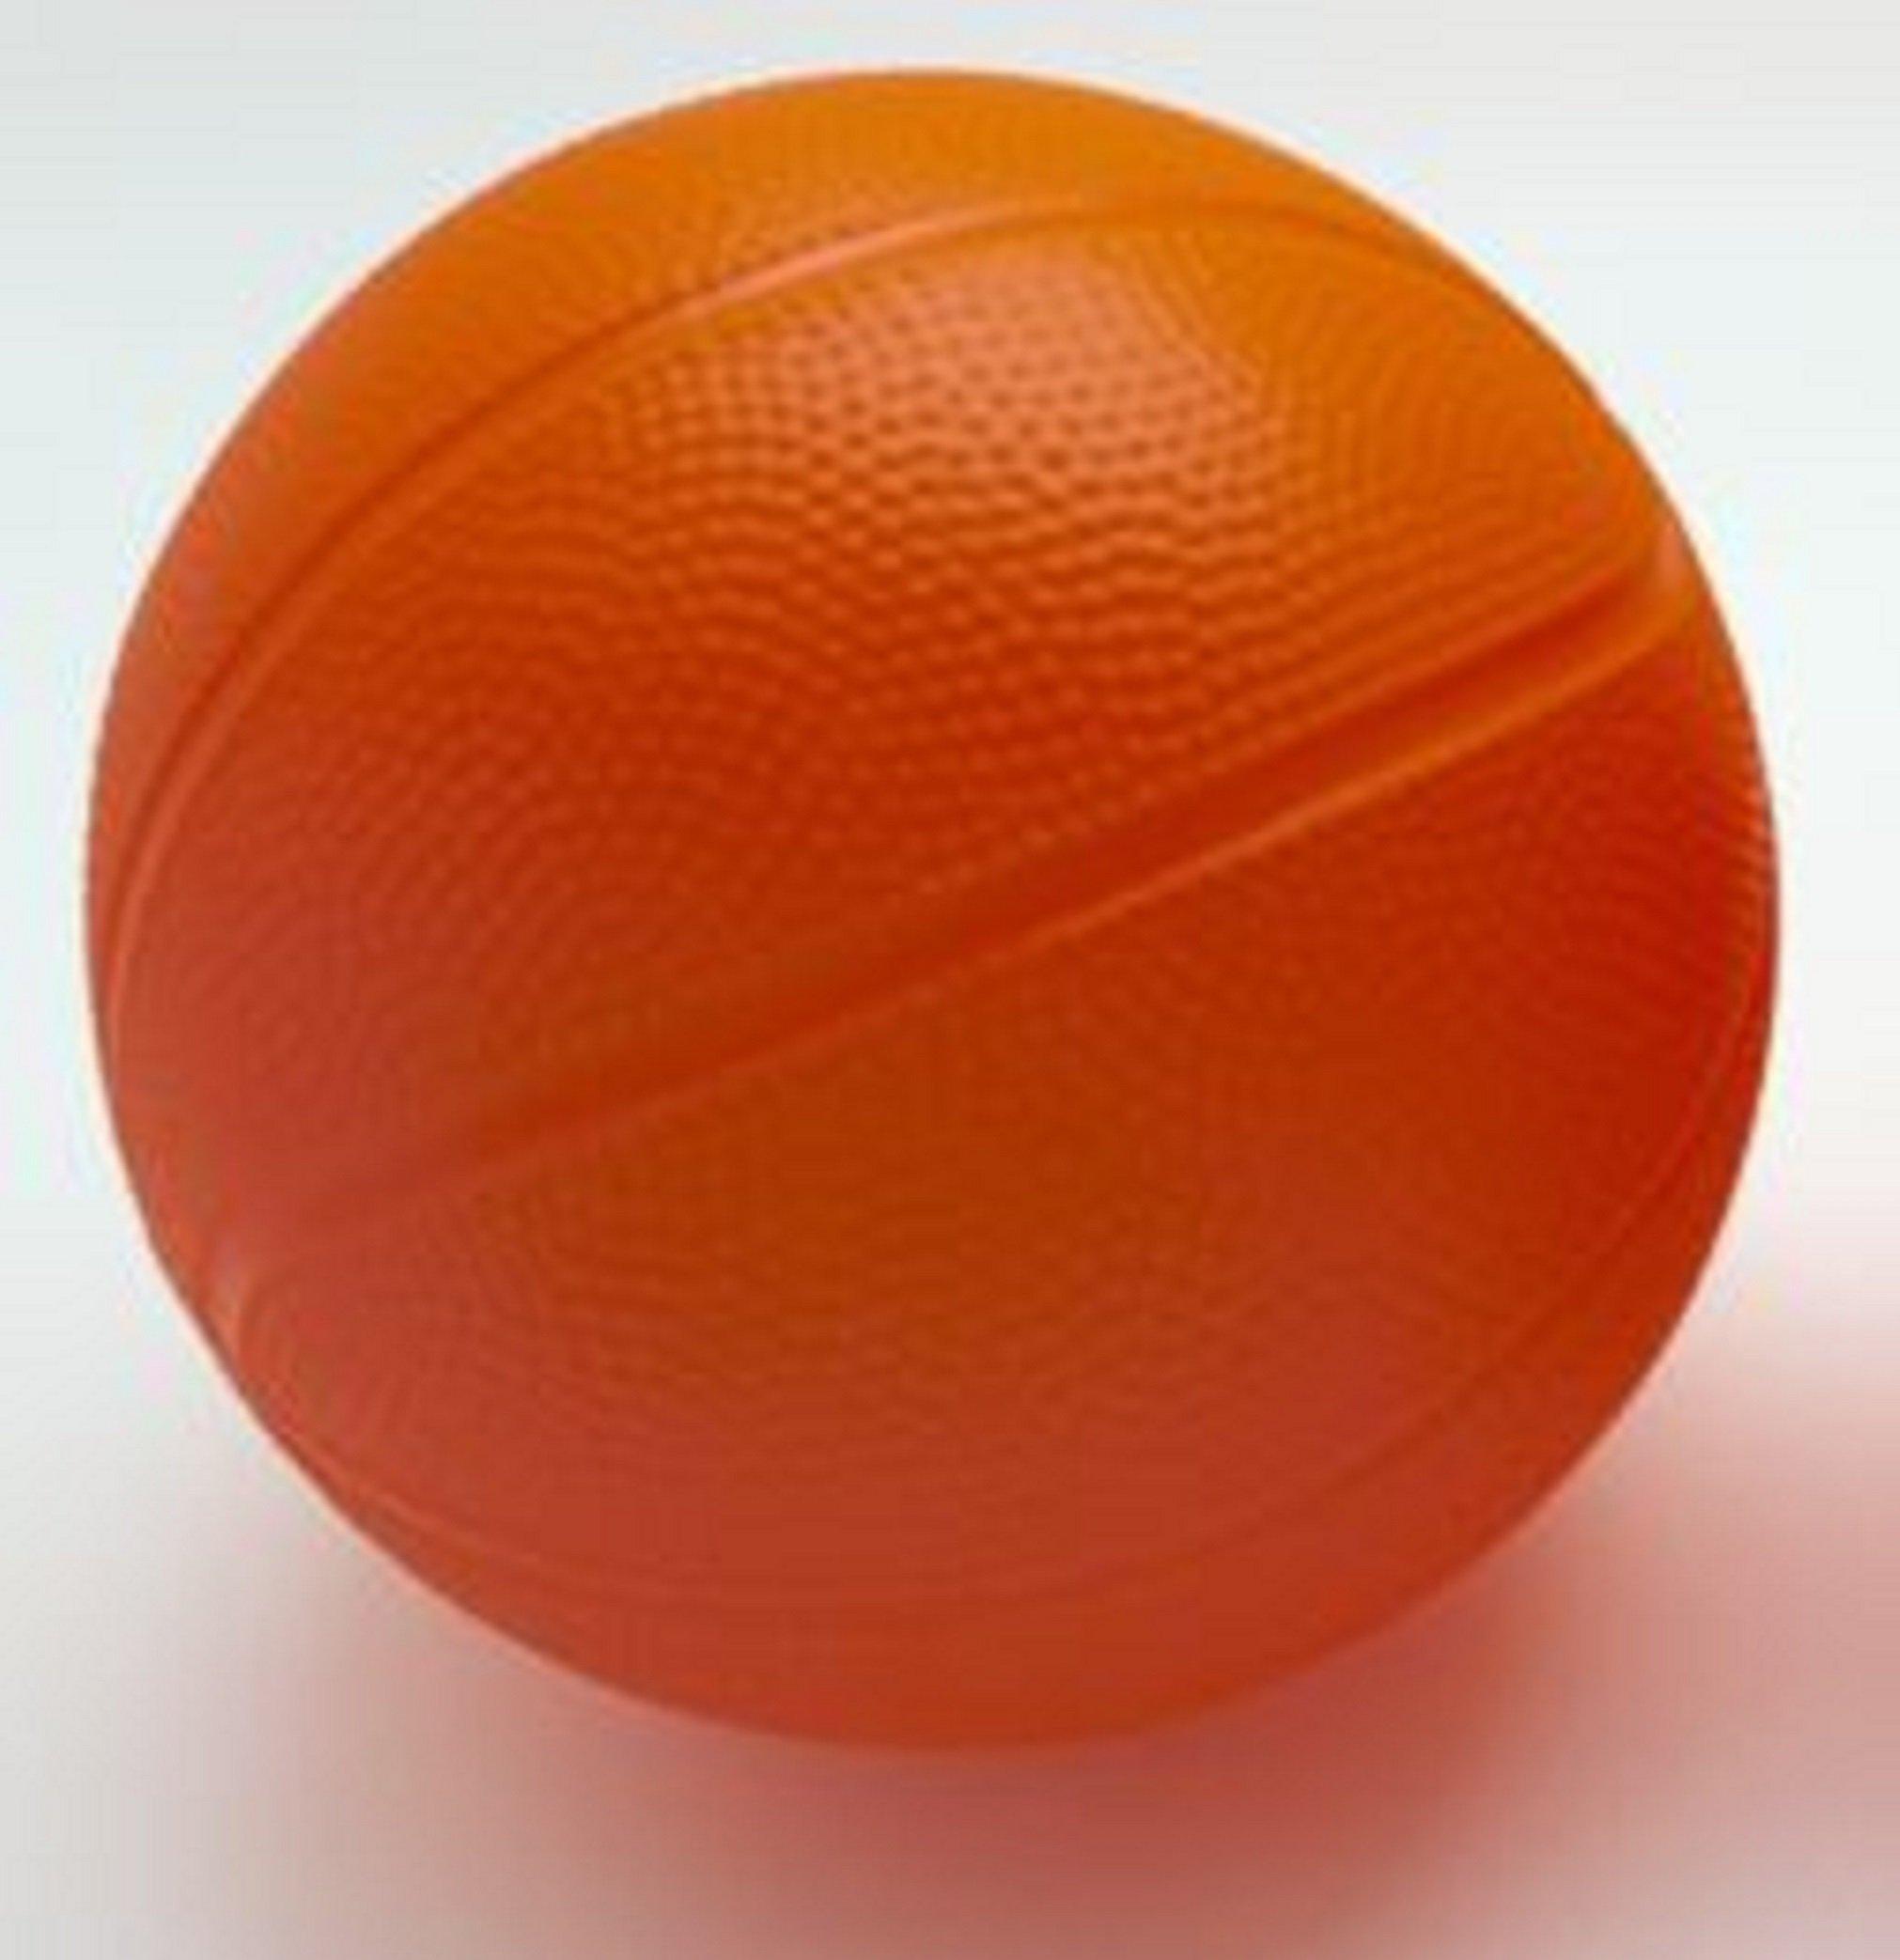 Little Tikes - Toddler / Kids Replacement Basketball Ball - 5.82 inch diameter